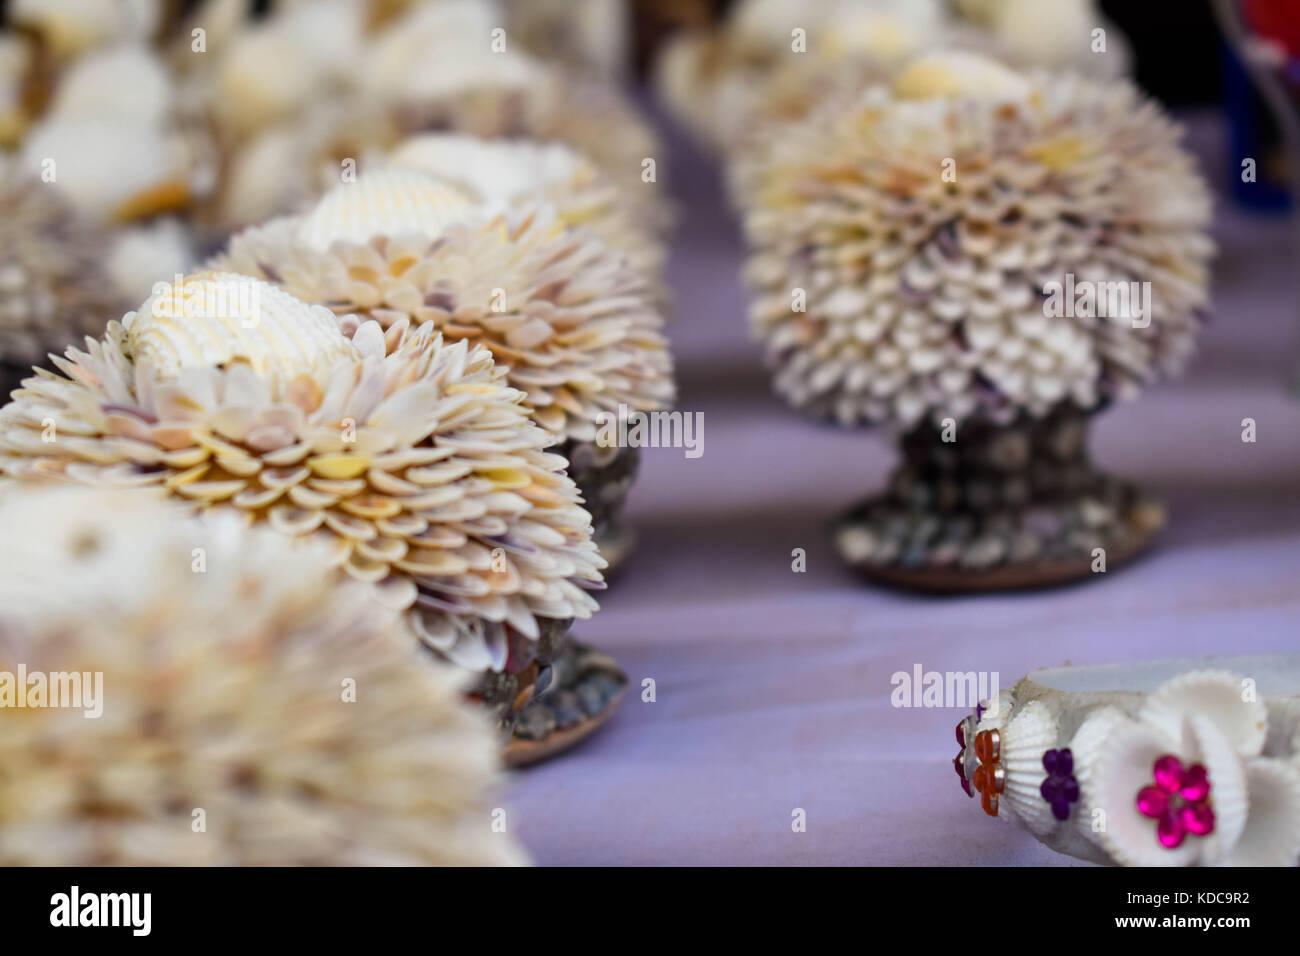 Beautiful handmade showpieces , Great background Image. - Stock Image